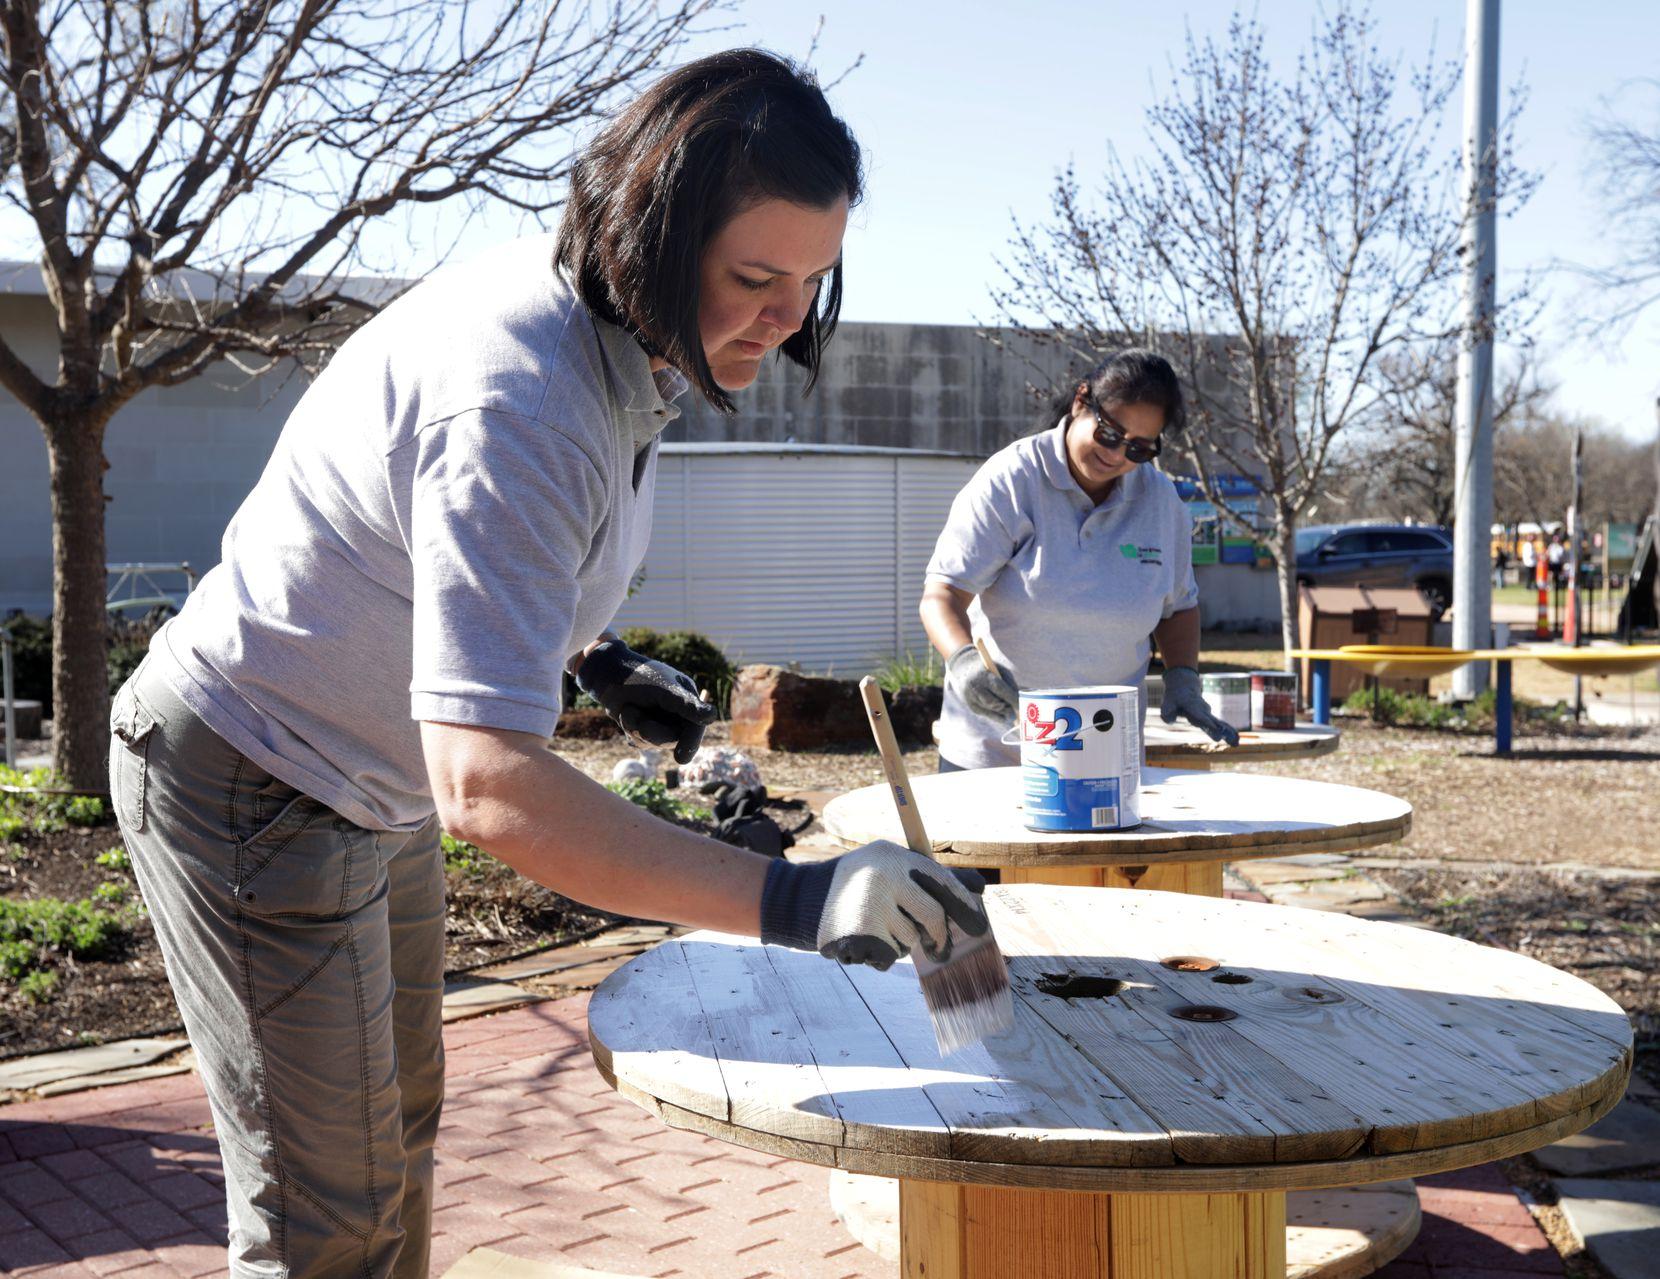 Jaime Bretzmann, left, and Nalini Joshi paint tables at the Environmental Education Center in Plano Thursday.